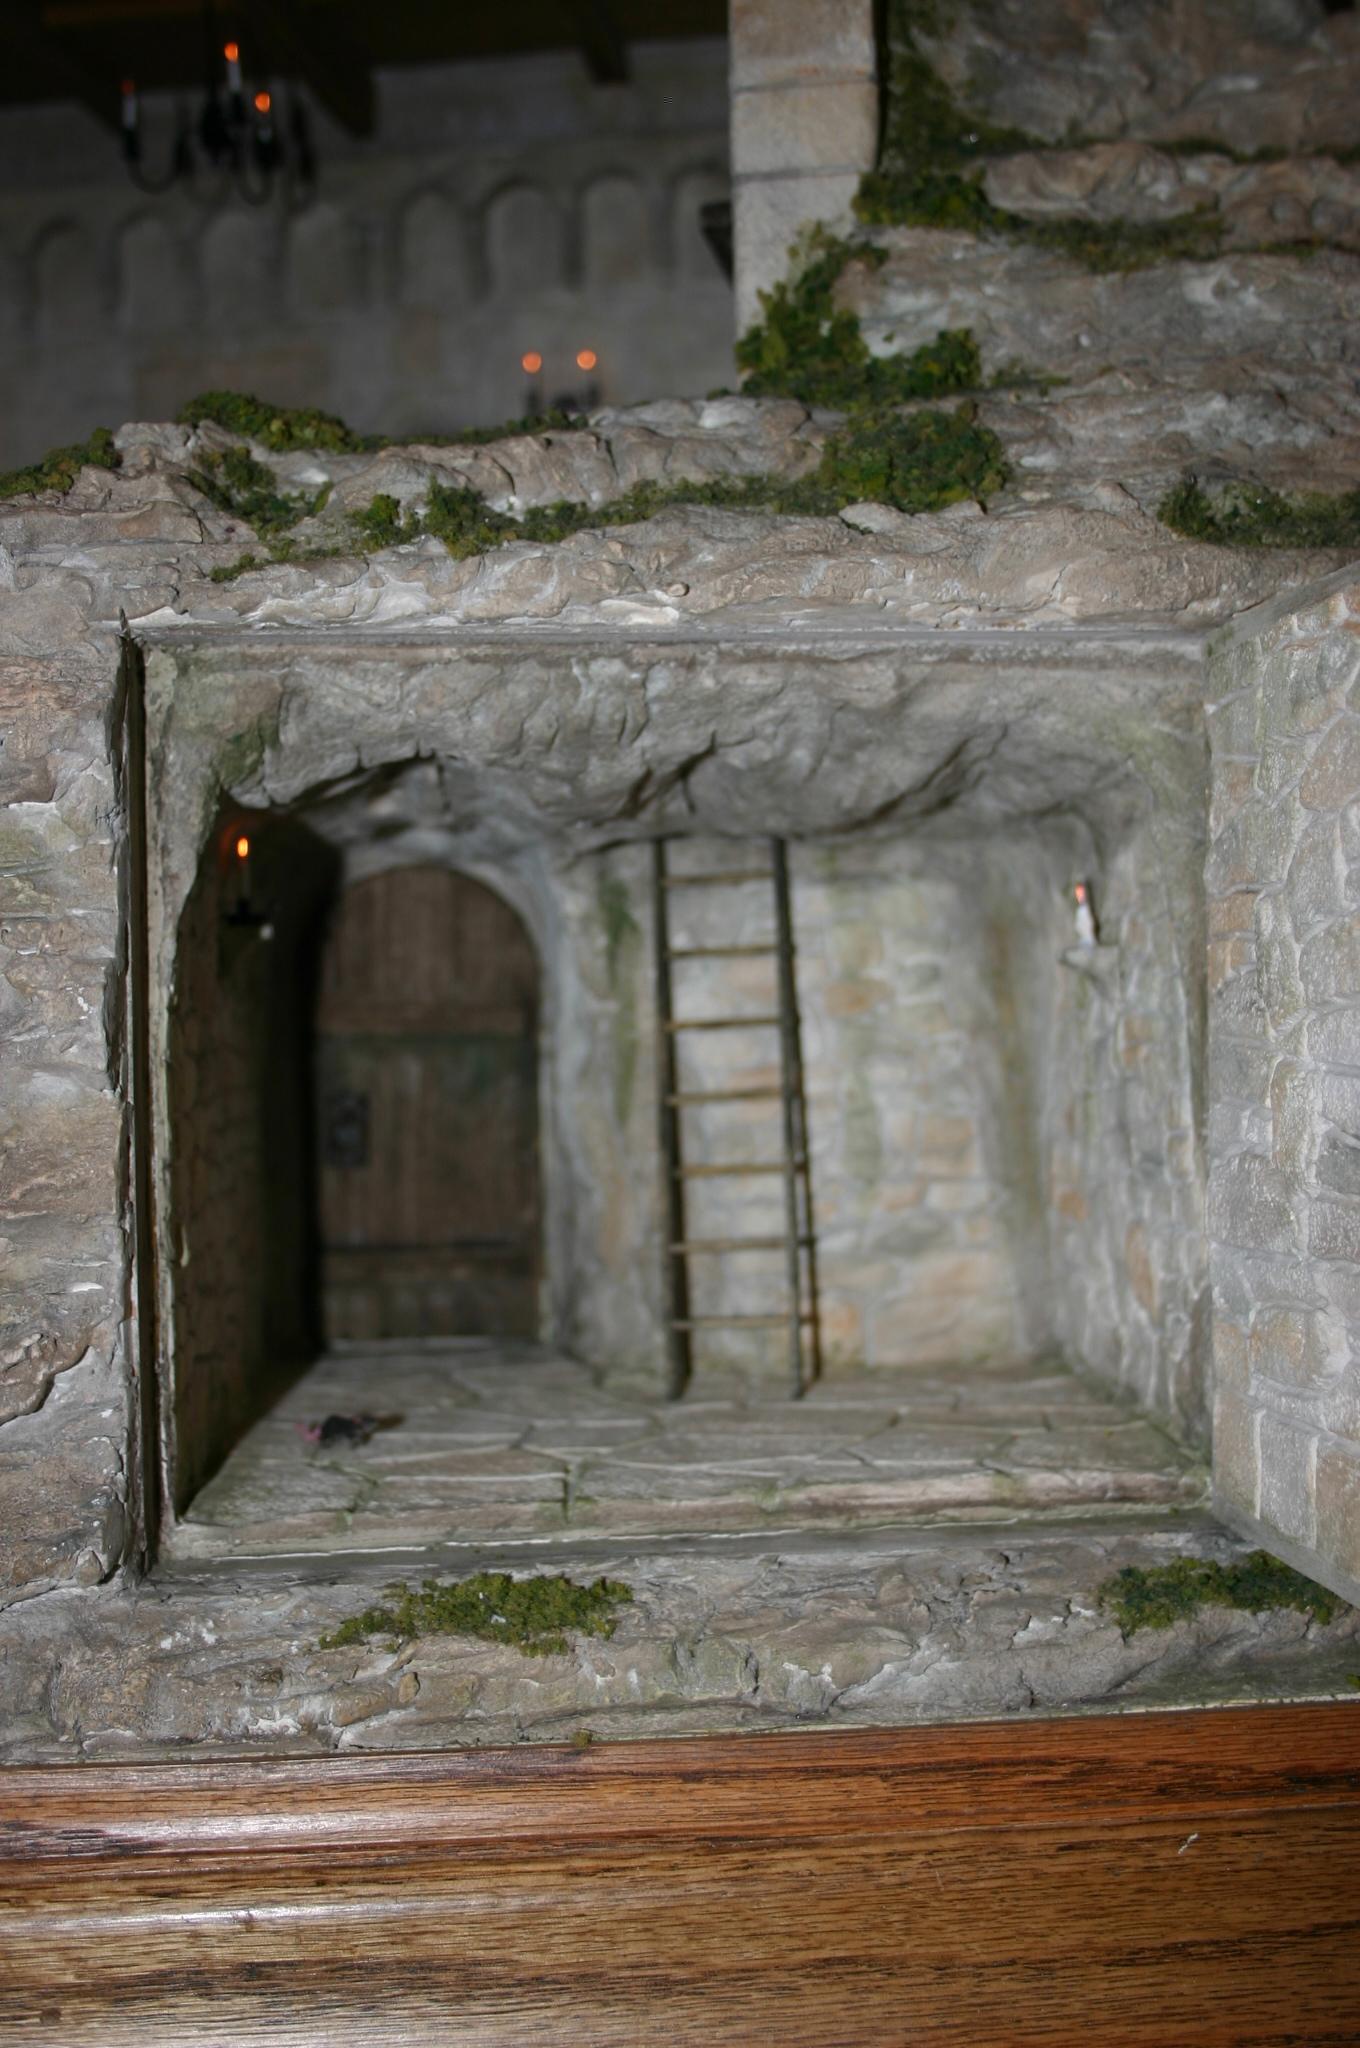 Smuggler's Hole